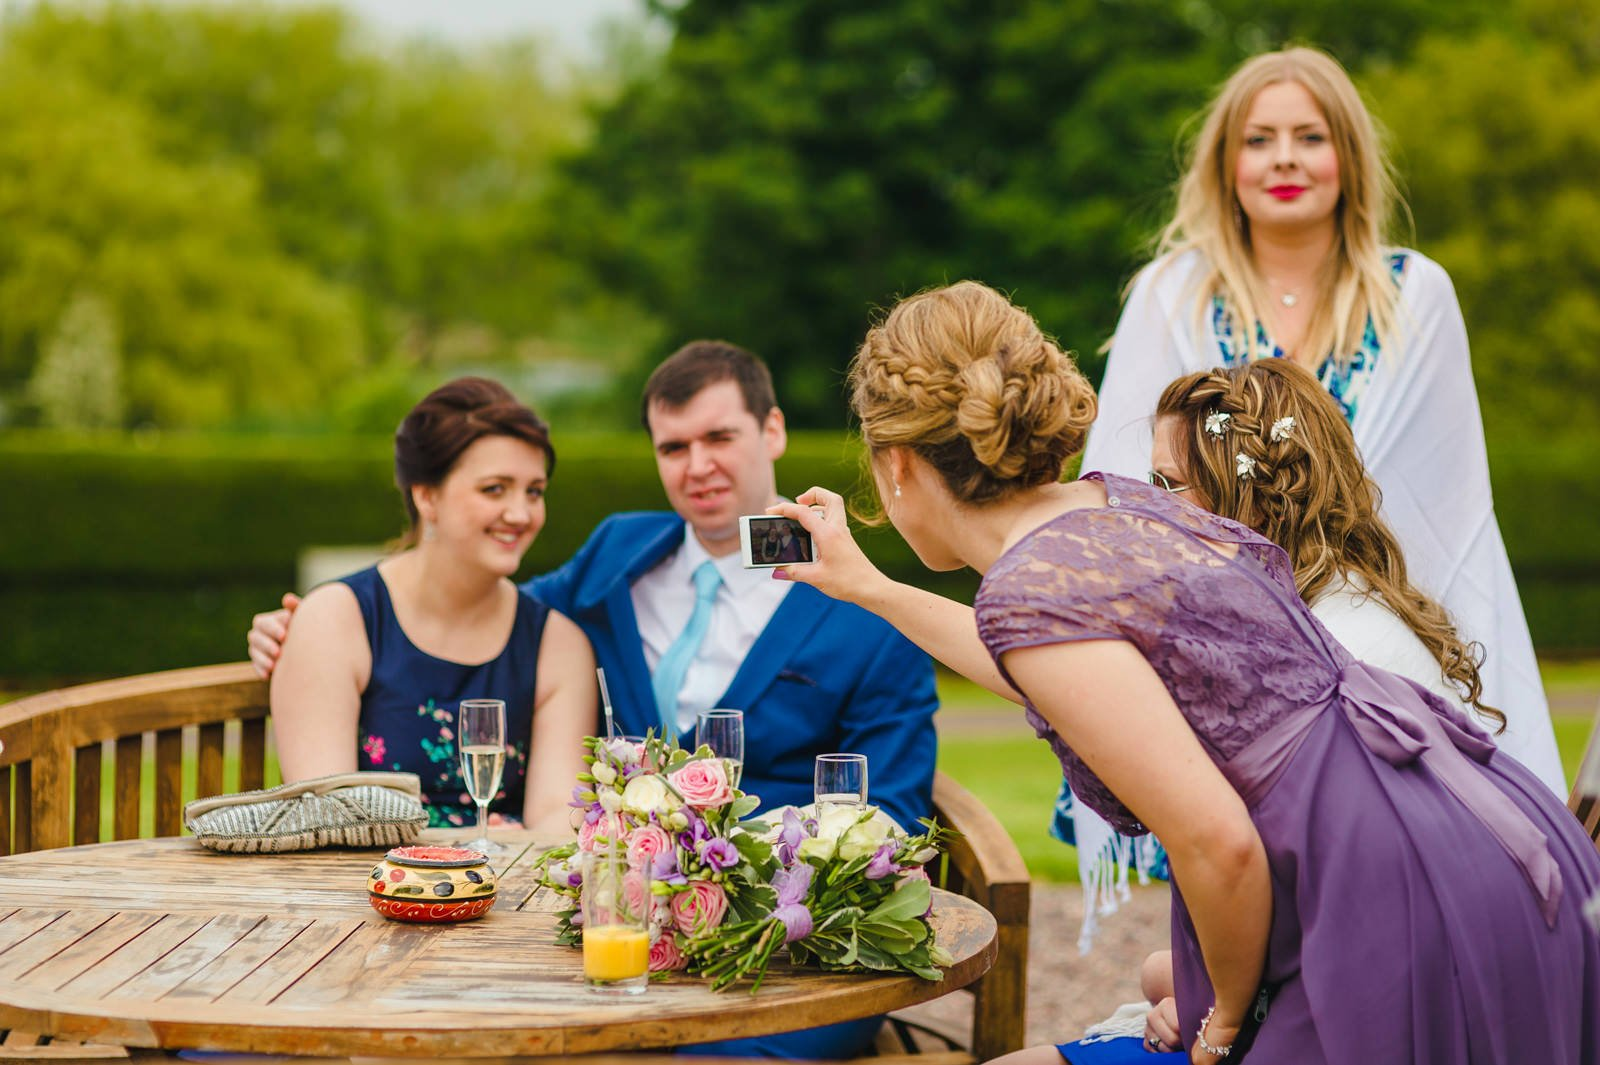 Millers Of Netley wedding, Dorrington, Shrewsbury | Emma + Ben 57